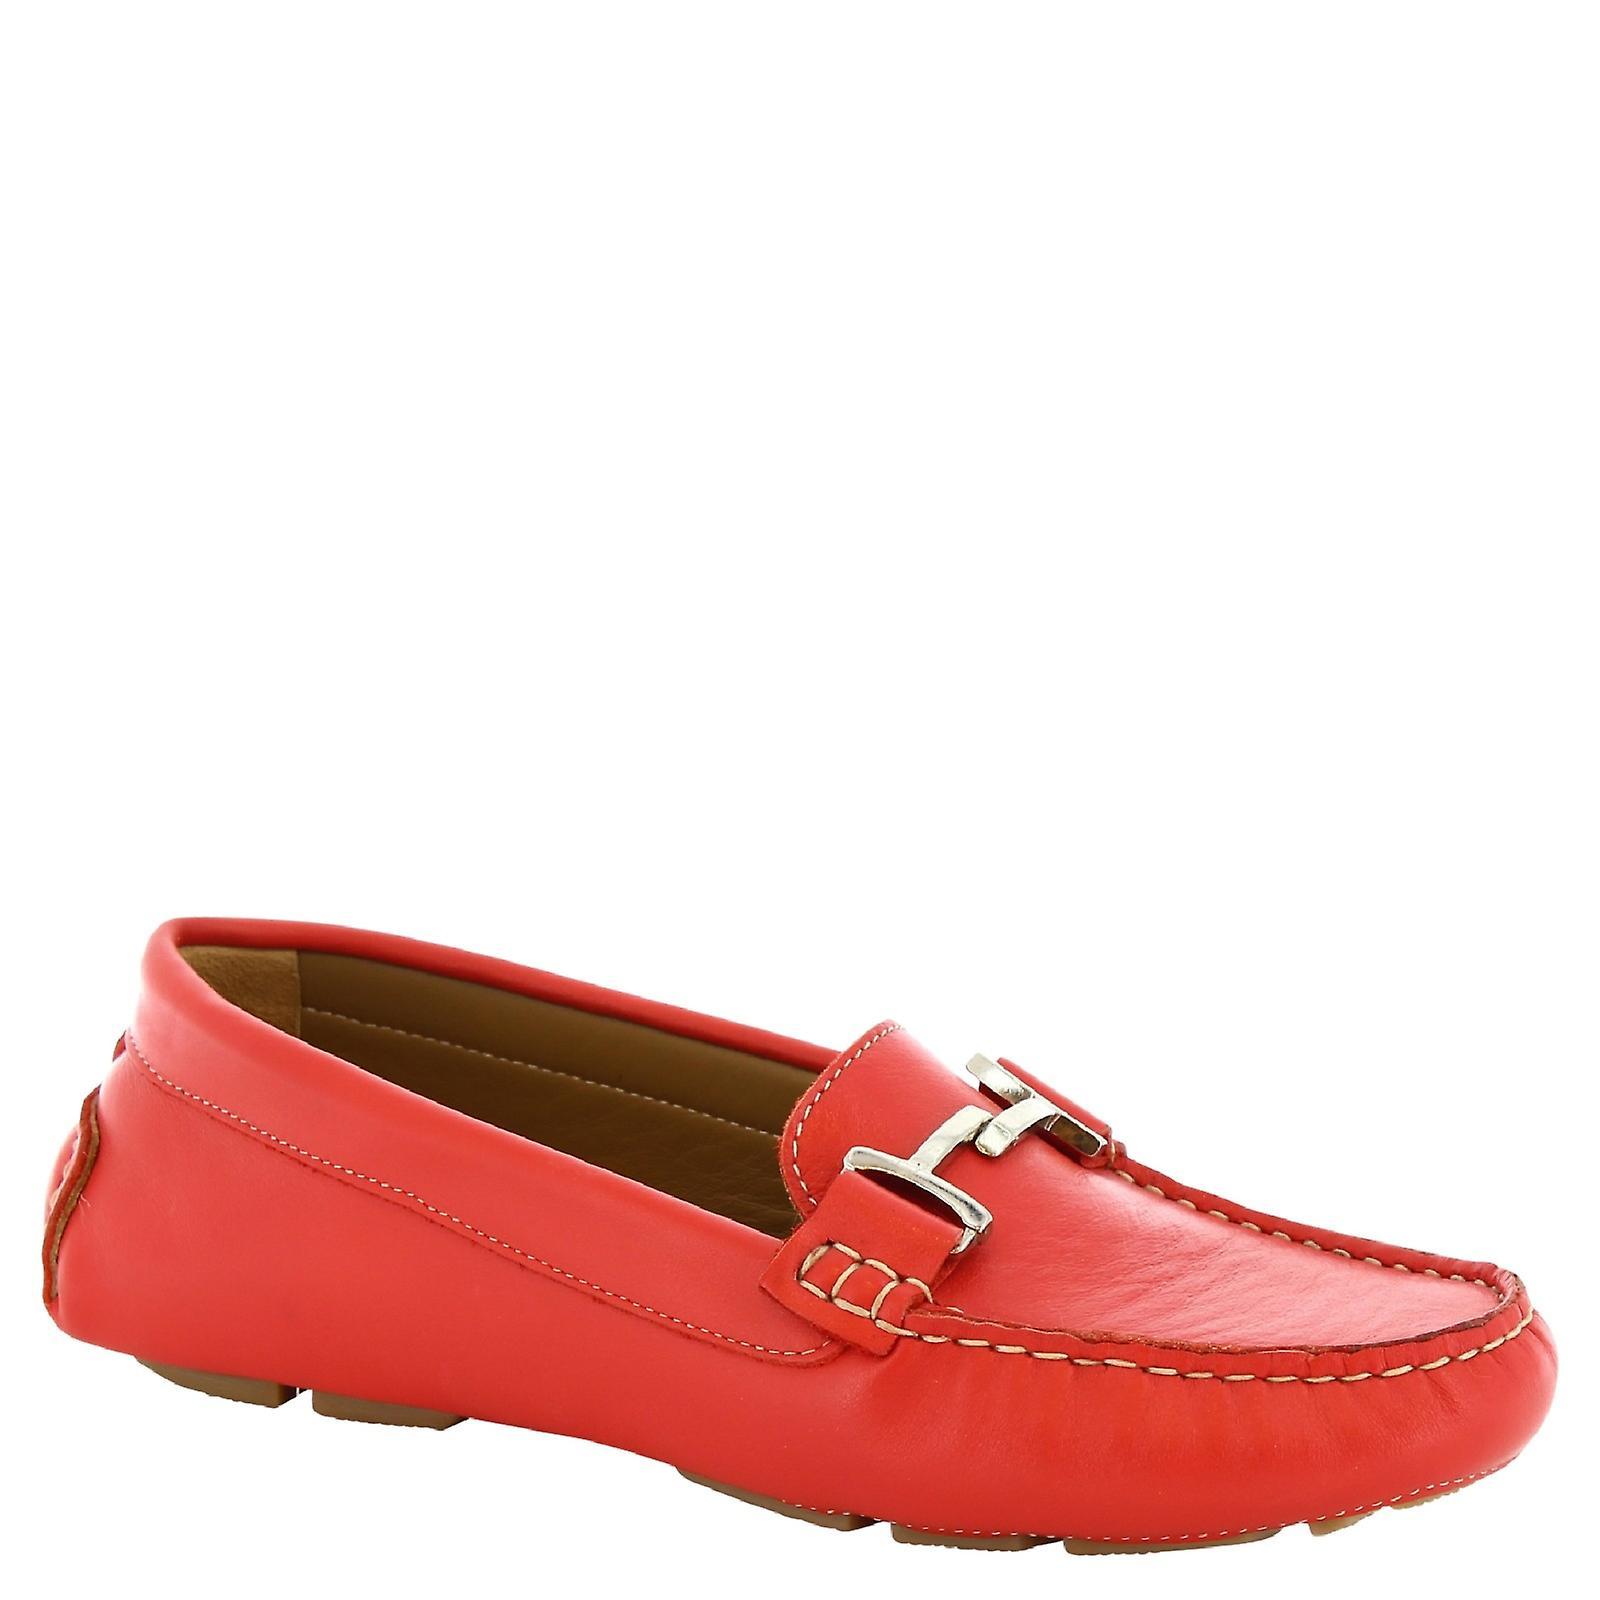 Leonardo Shoes Women's handmade bit loafers in red calf leather